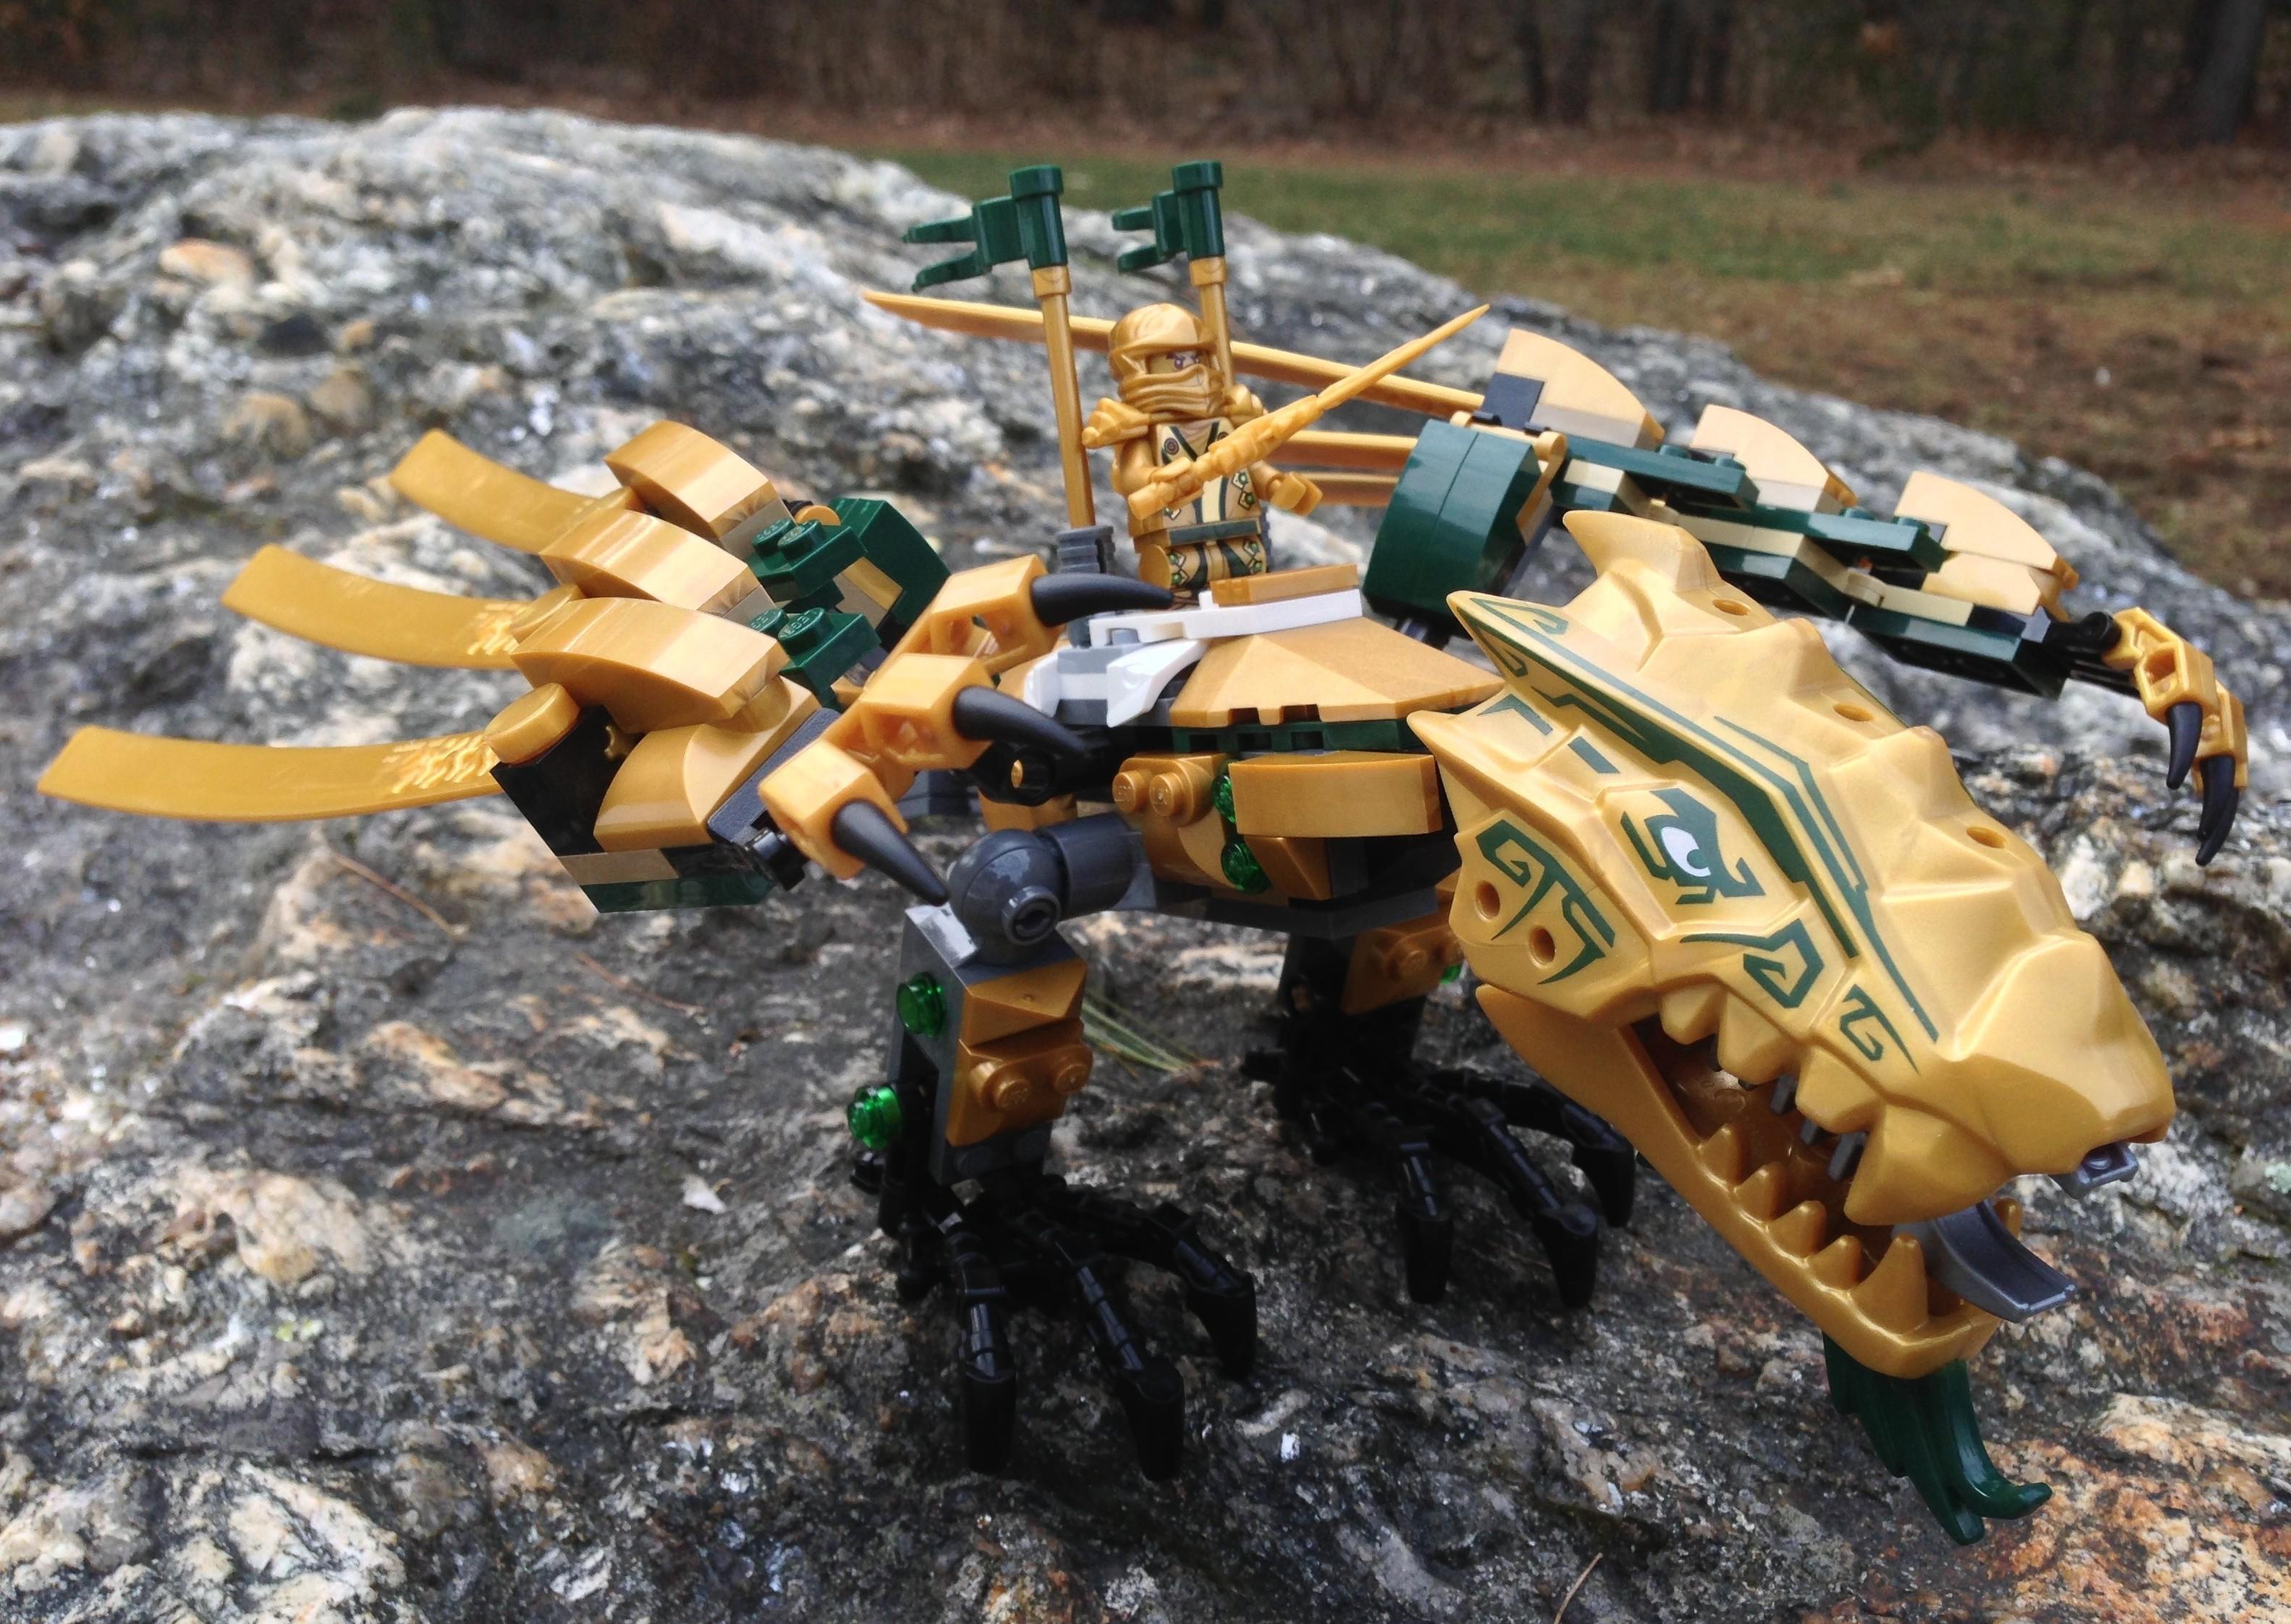 lego ninjago golden dragon 70503 review photos bricks and bloks. Black Bedroom Furniture Sets. Home Design Ideas